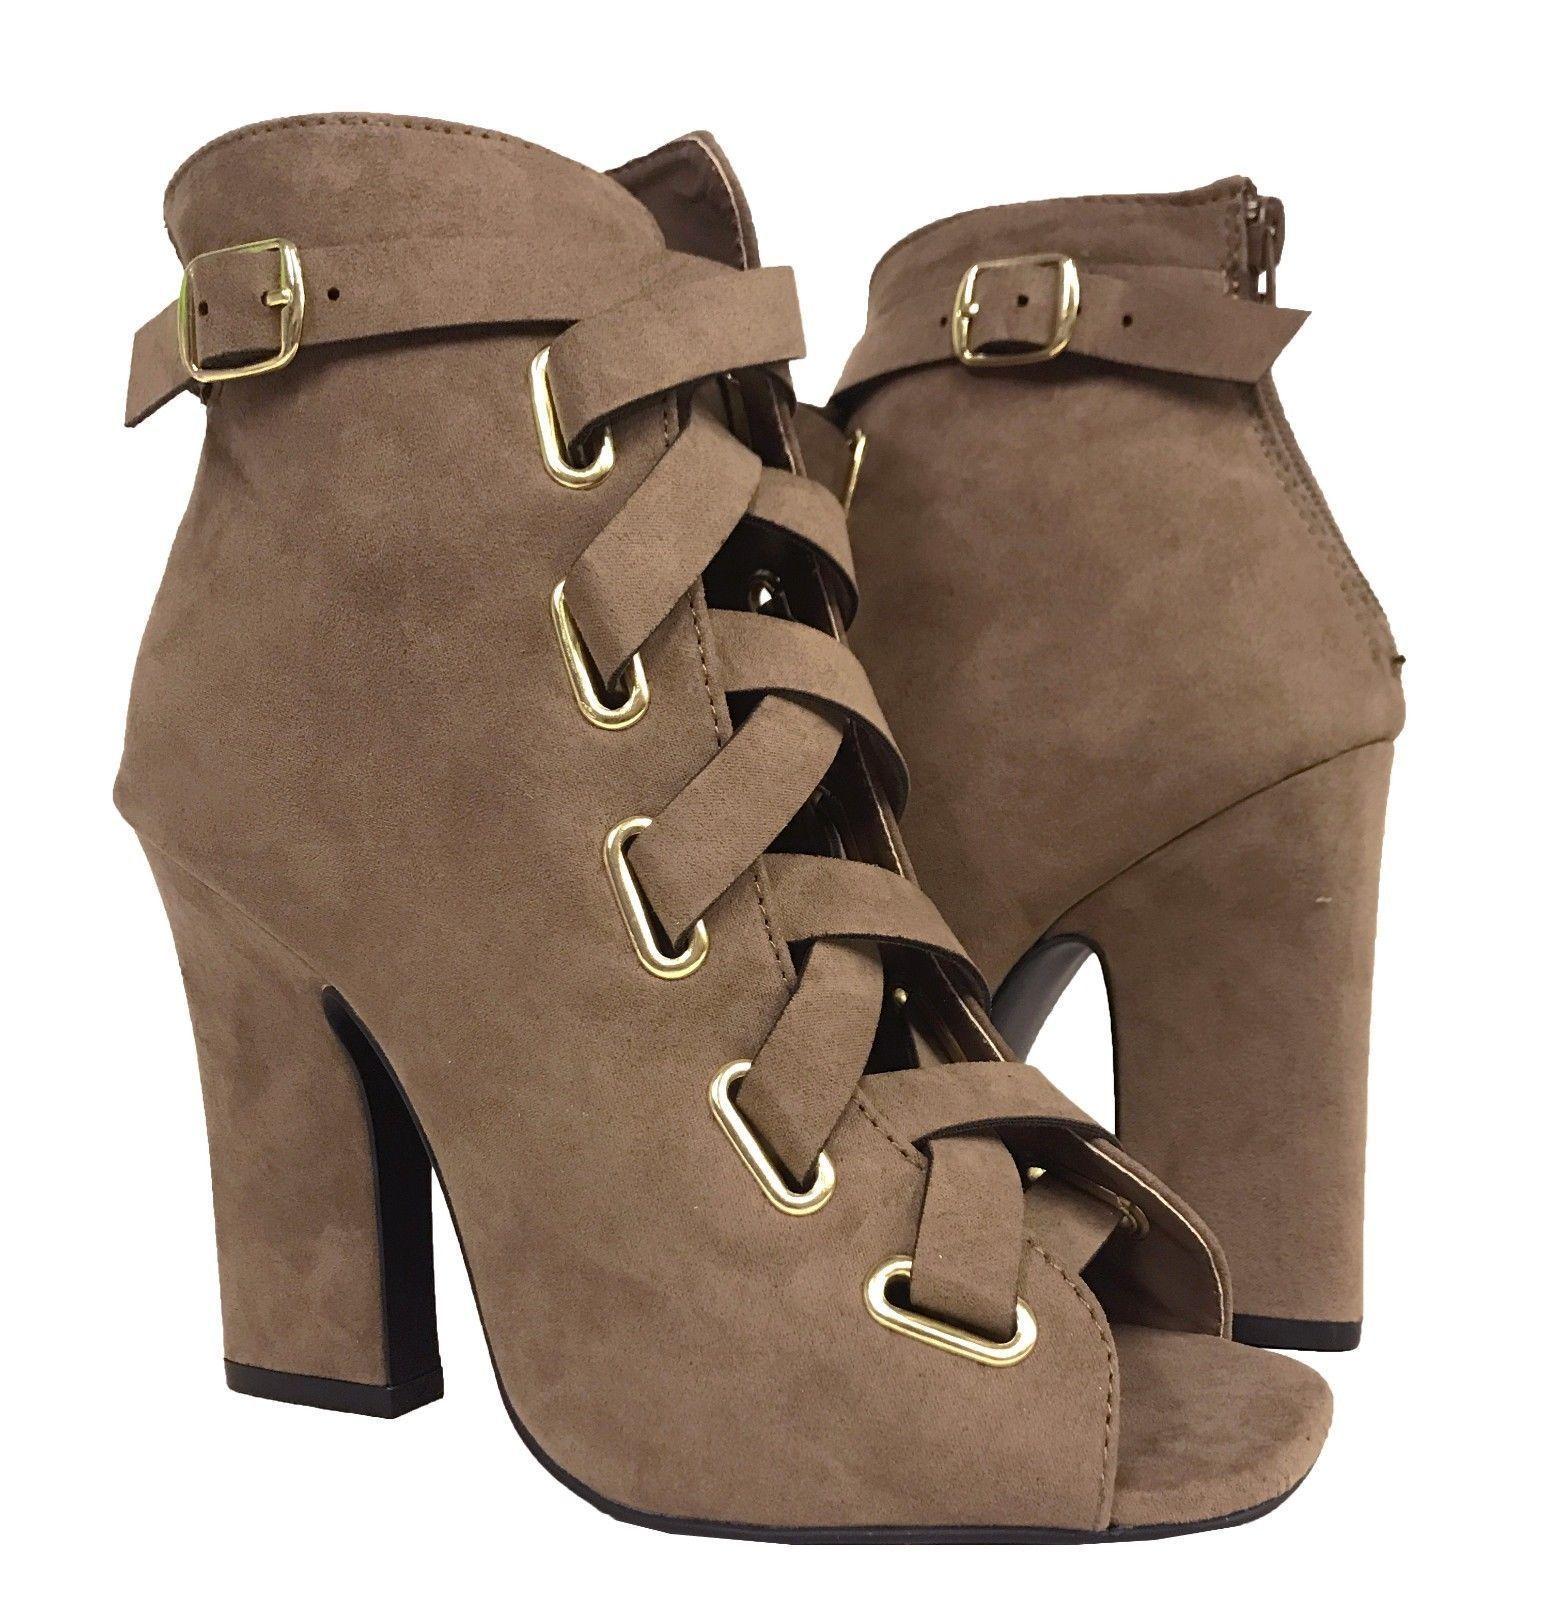 78ed0c9e3e5 Qupid Women s Lite-04 Peep Toe Ankle Buckle and 50 similar items. S l1600